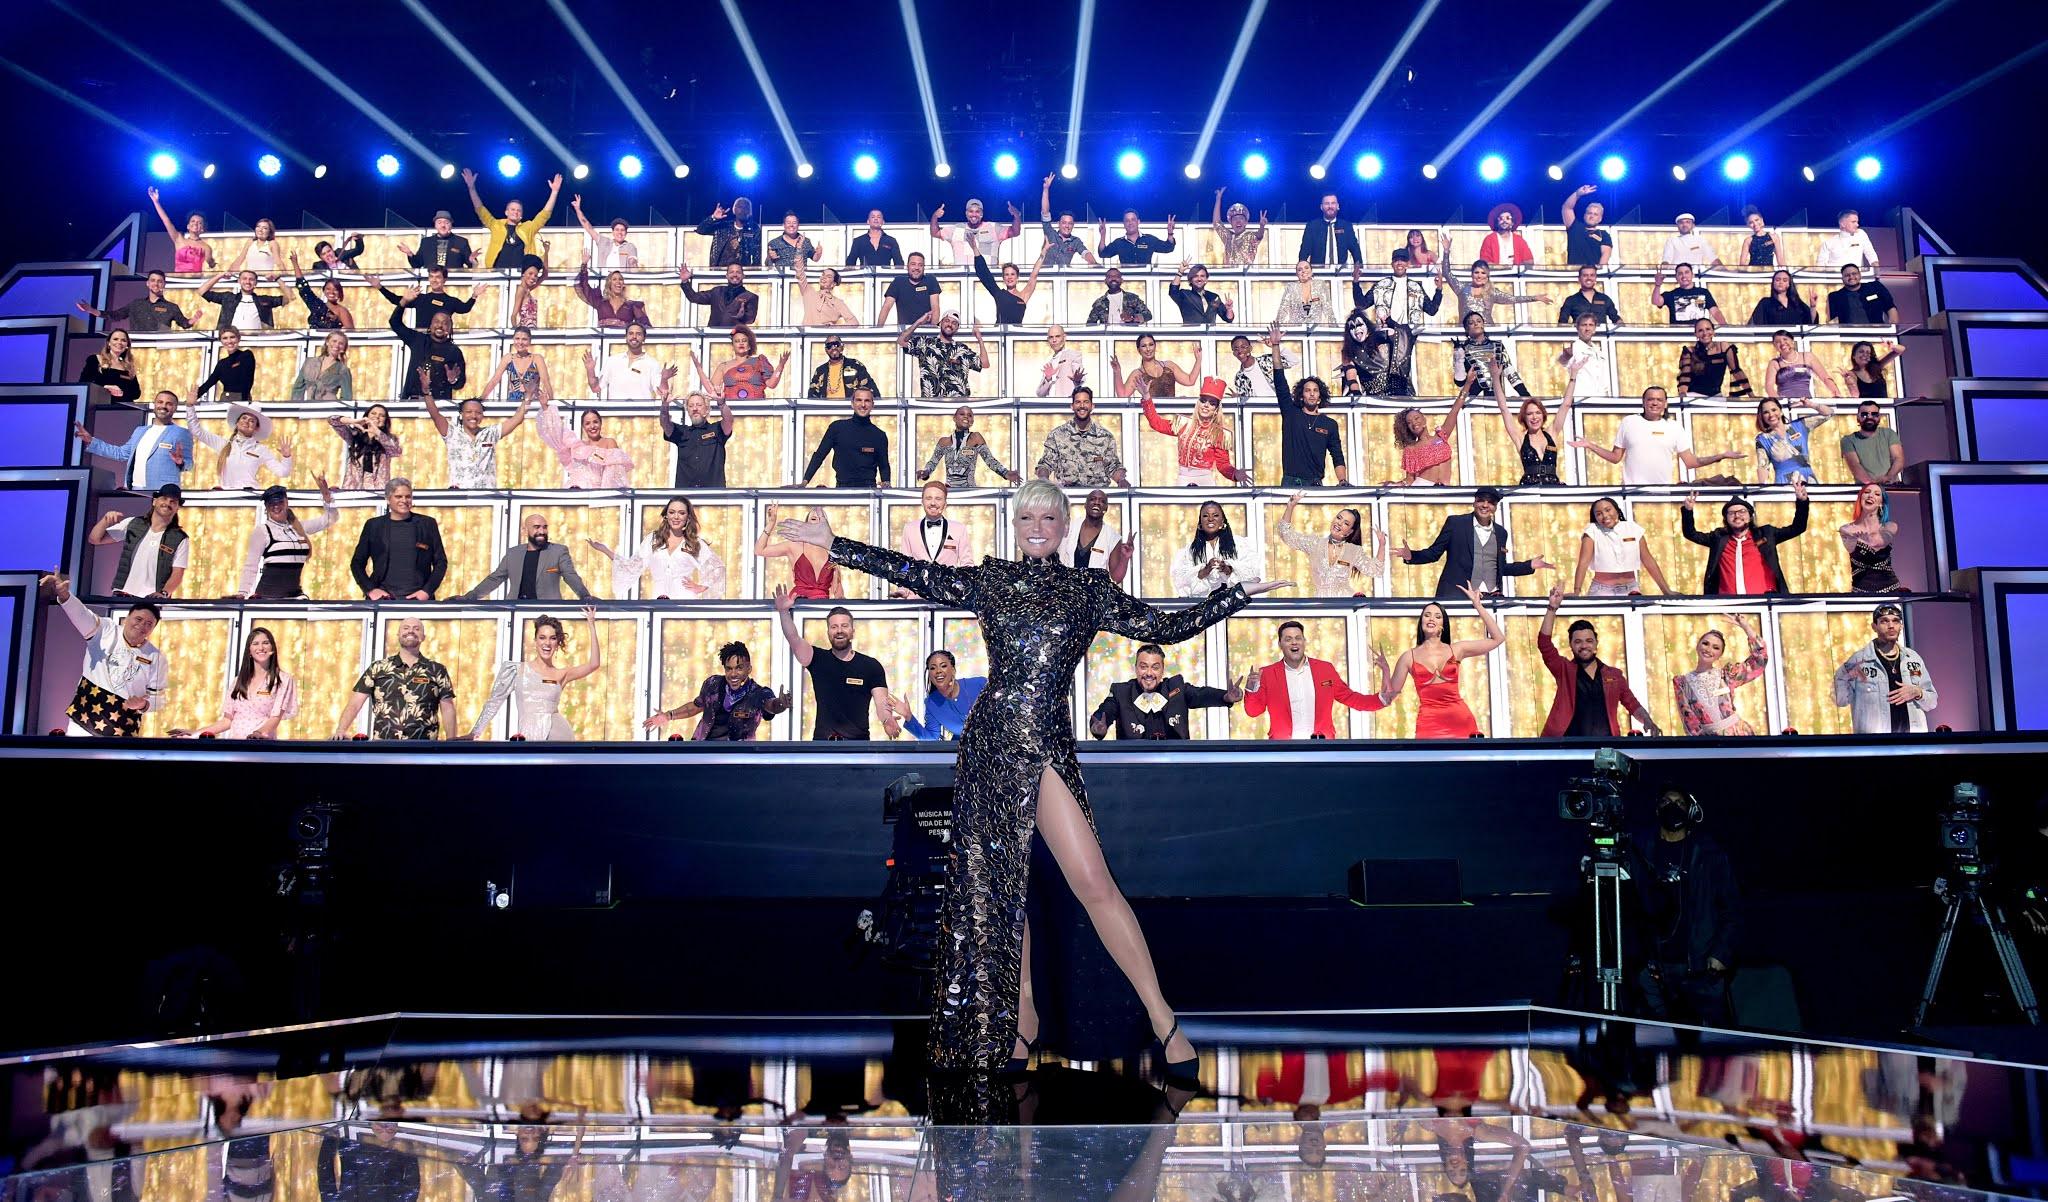 Xuxa Meneghel e os jurados no palco do Canta Comigo All Stars (Blad Meneghel/Record TV)